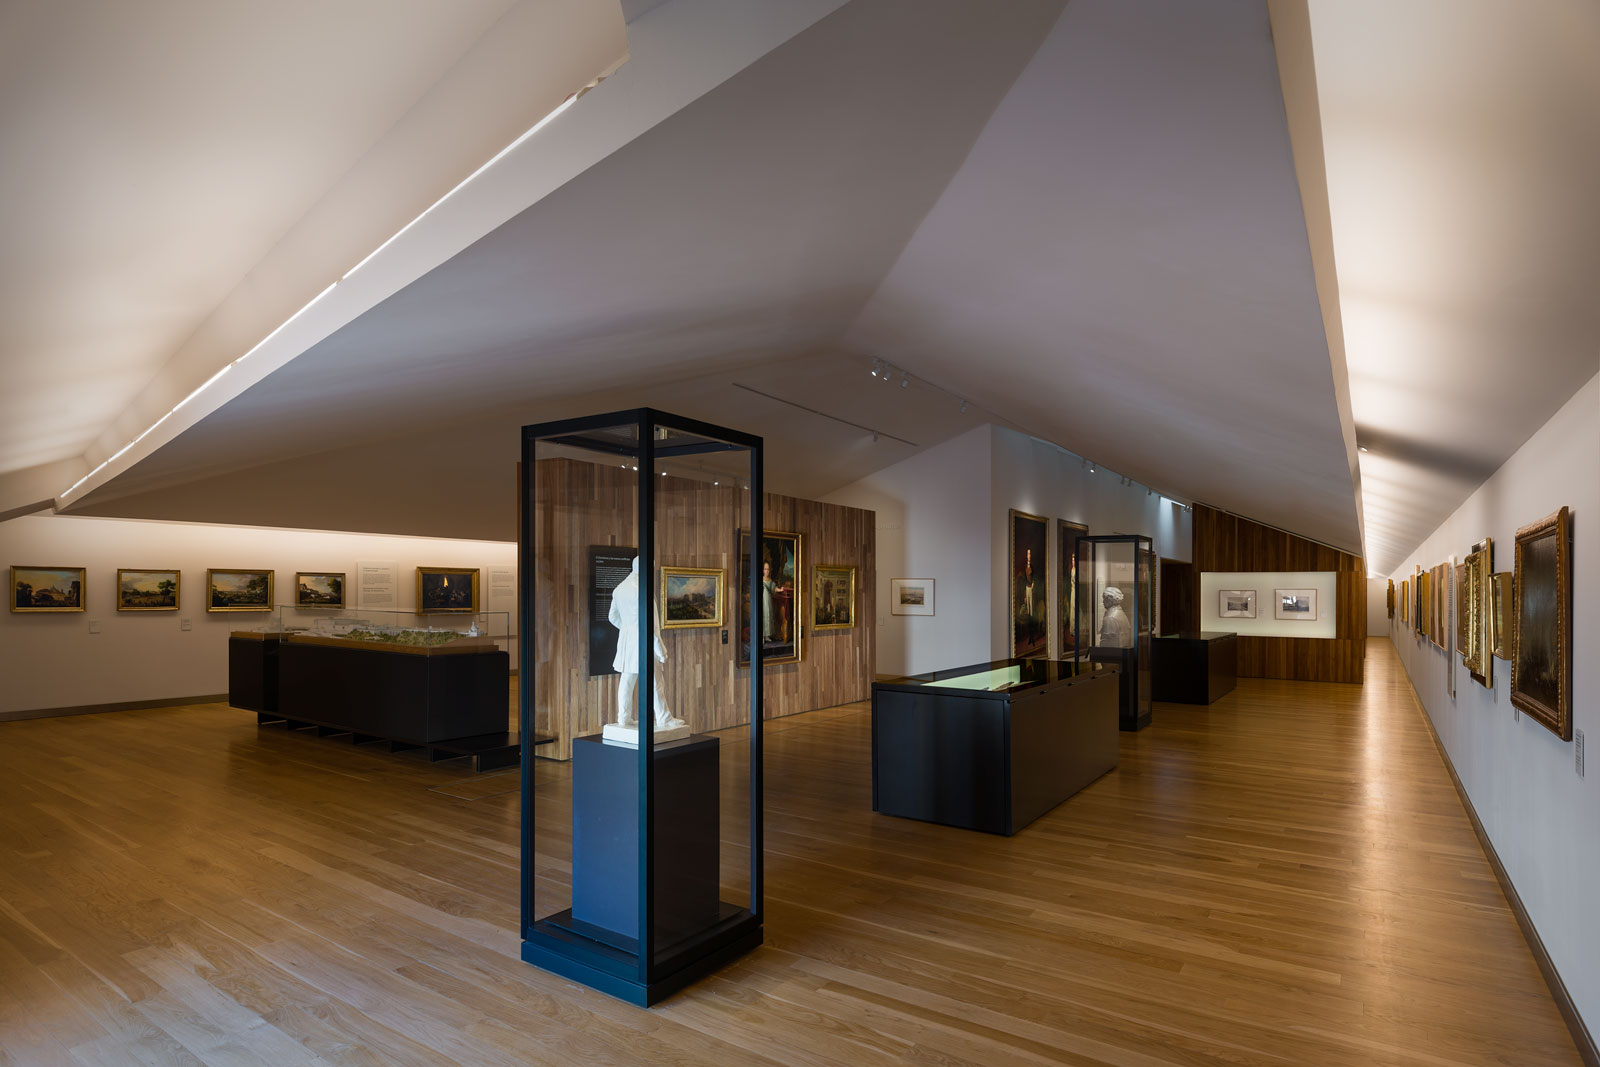 Museo de Historia de Madrid · Ypuntoending · 014.jpg